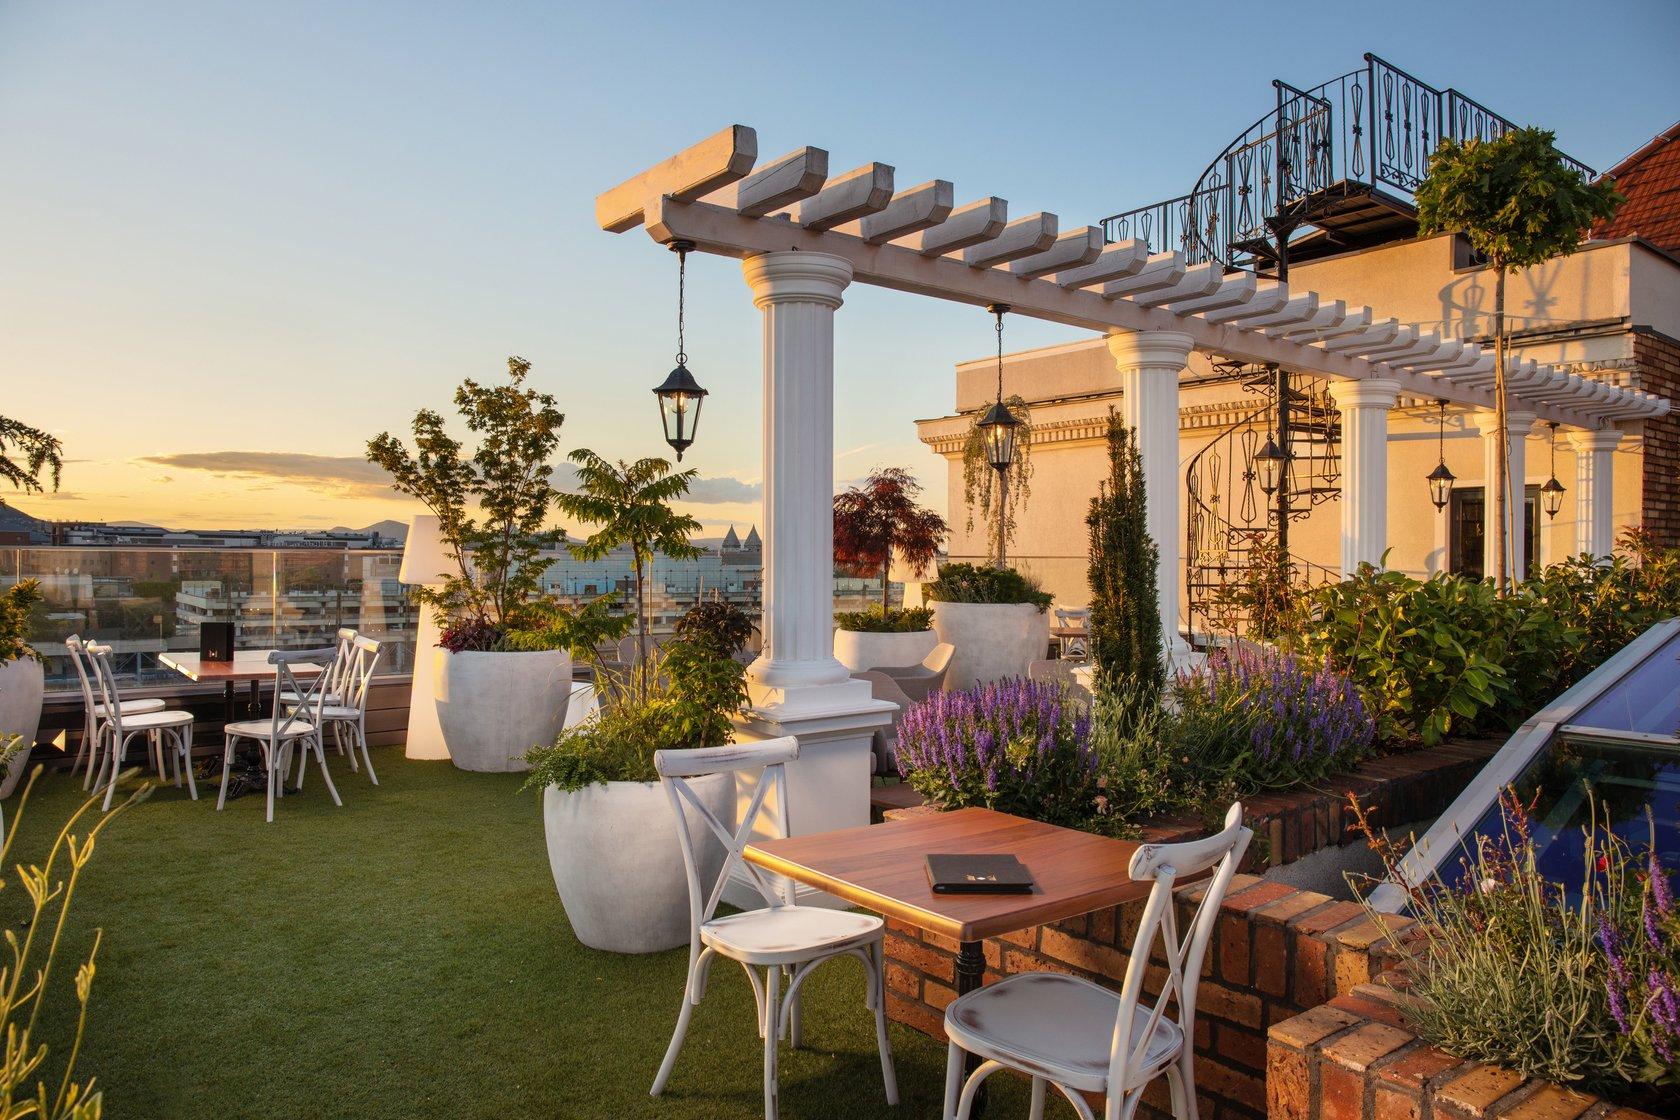 Mystery_Hotel_Budapest_The_Sky_Garden_Rooftop_Terrace